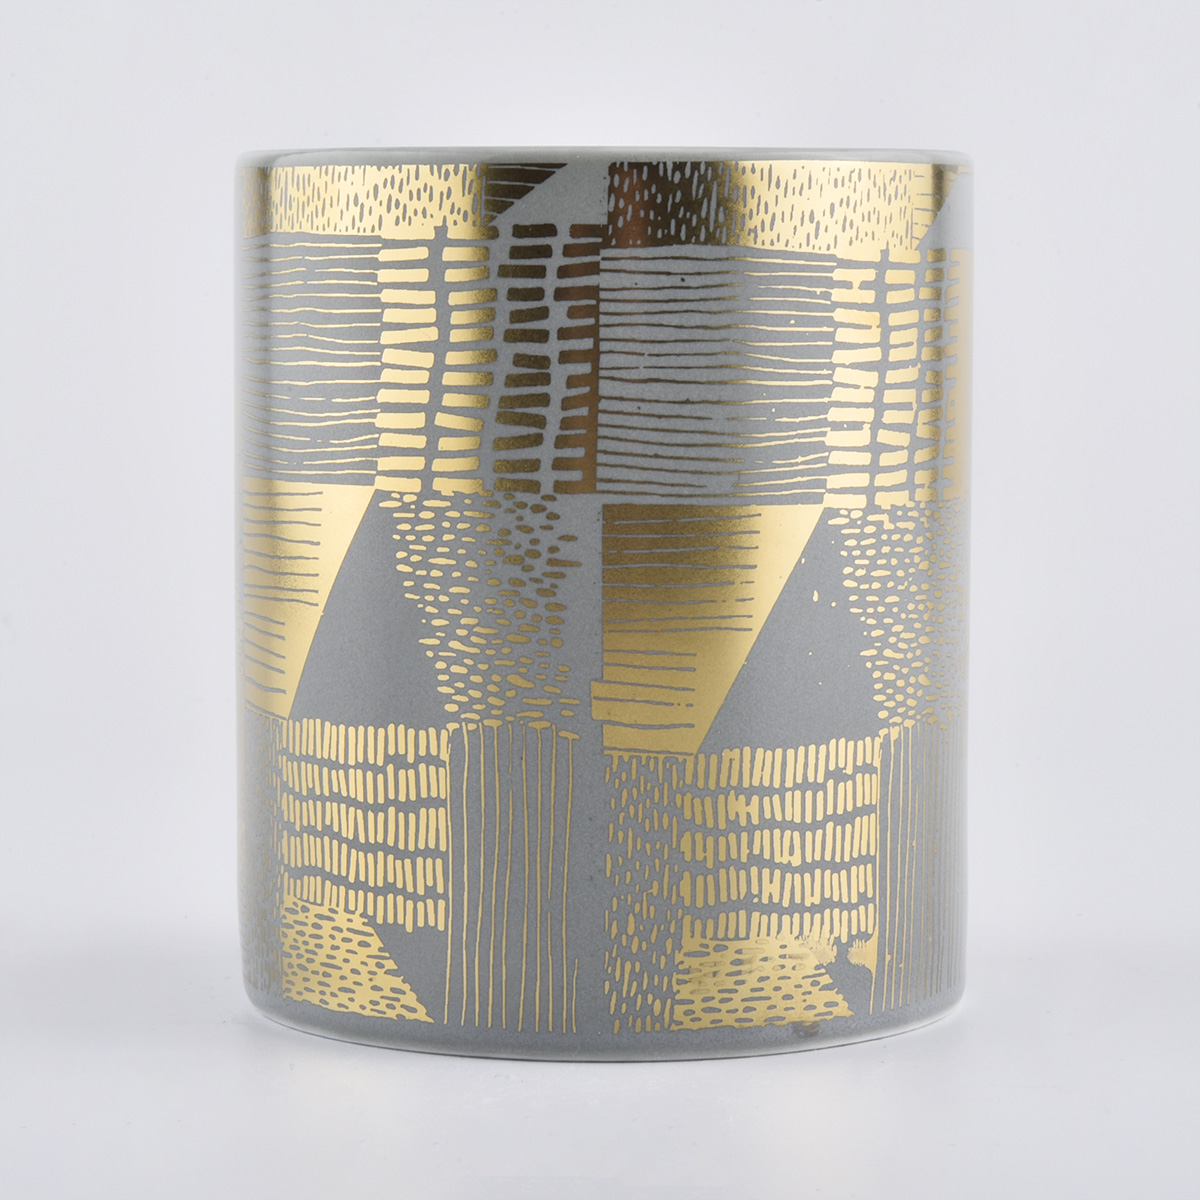 luxury 12oz ceramic candle jars in gold printing